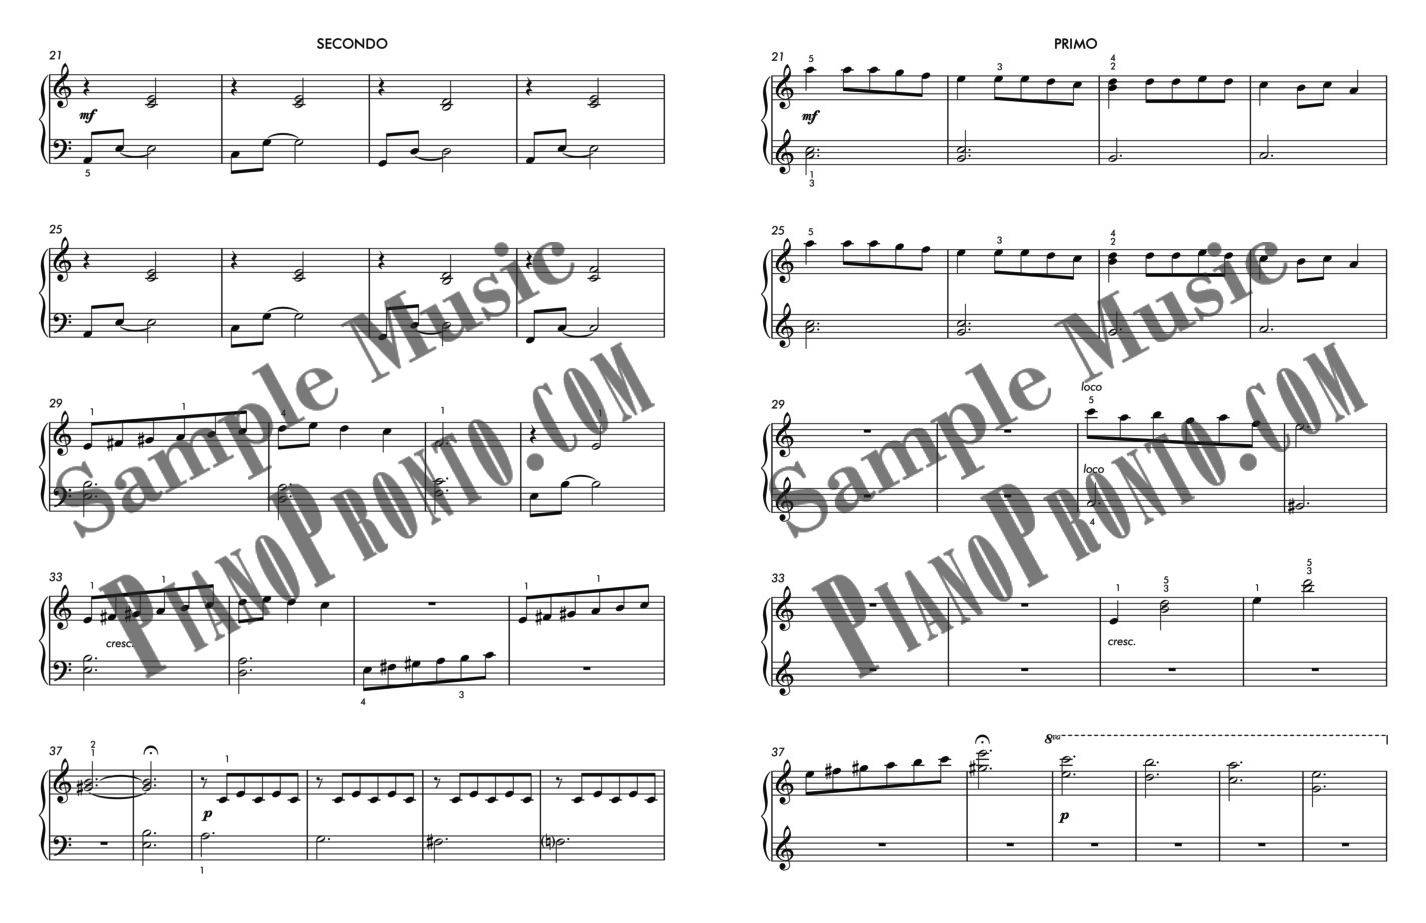 graphic relating to Carol of the Bells Free Printable Sheet Music titled Ukrainian Bell Carol Duet